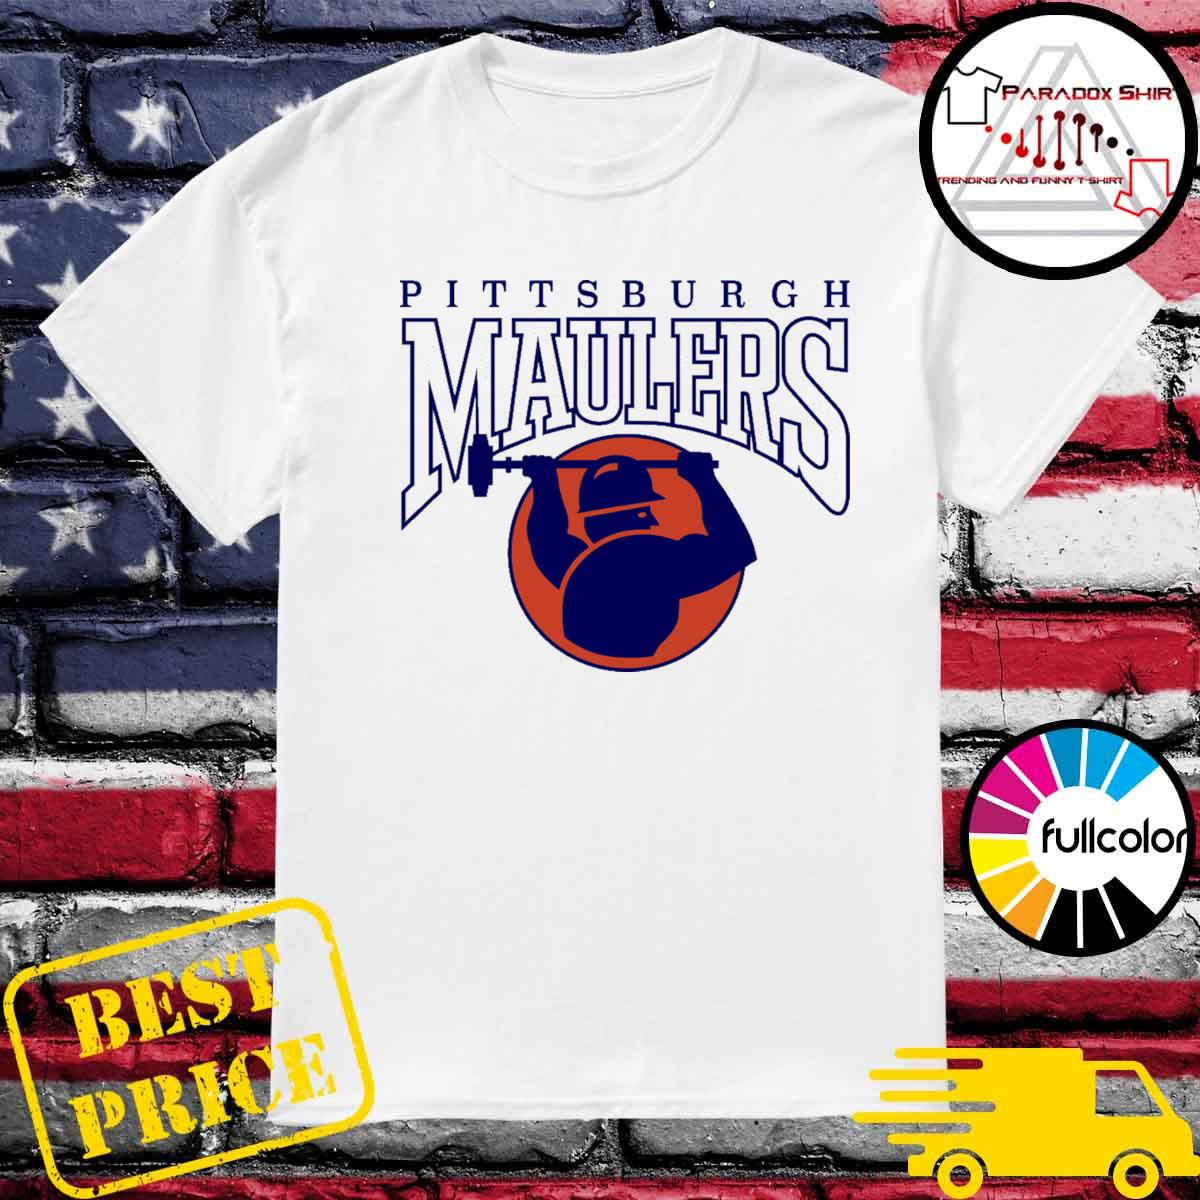 Pittsburgh Maulers football logo shirt